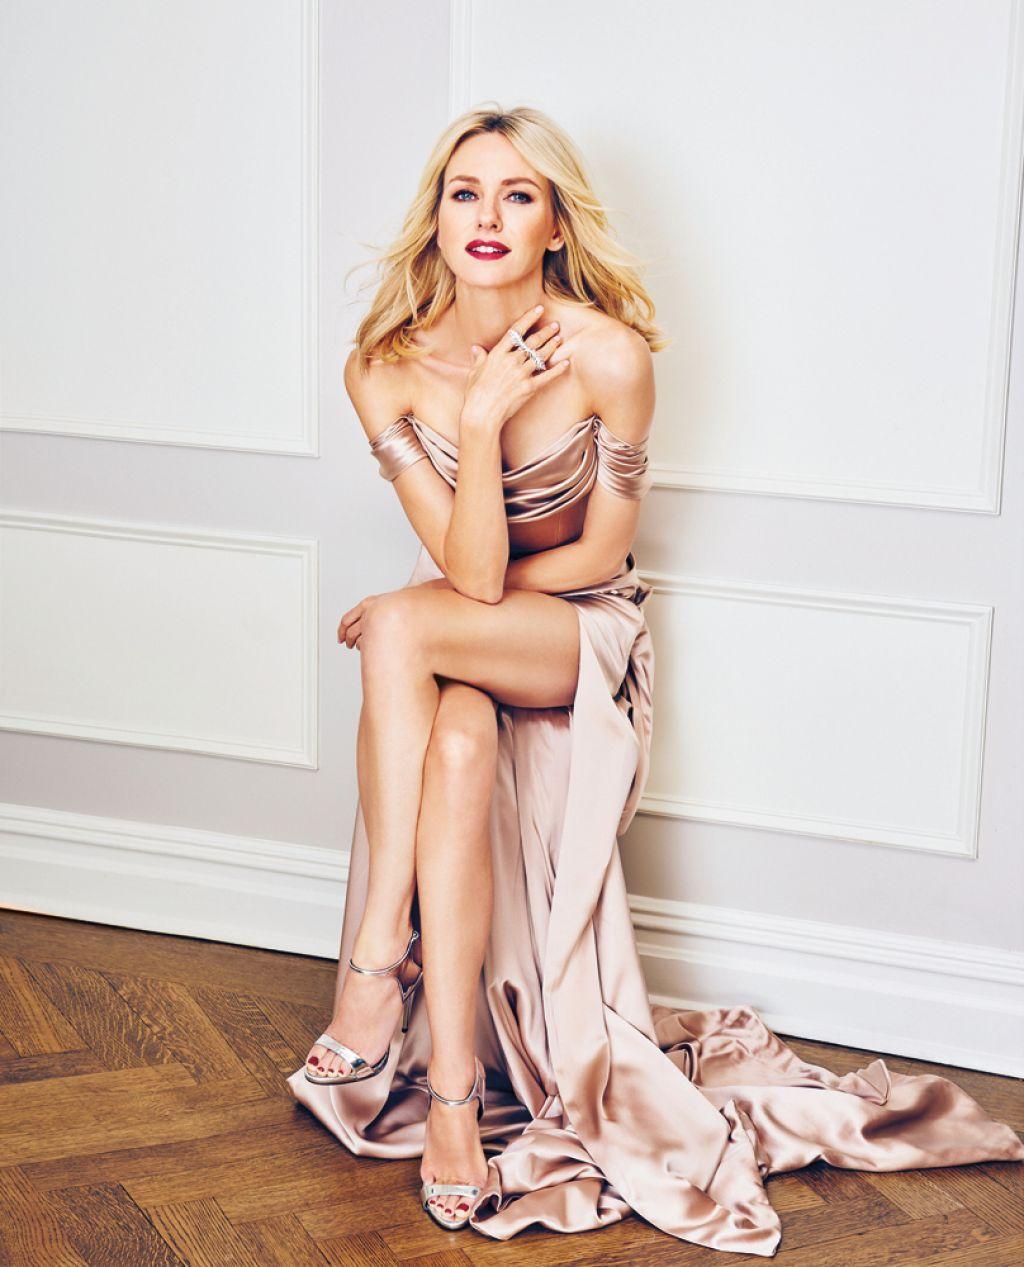 Naomi Watts sexy legs cleavages wow @ Naomi Watts ... Naomi Watts